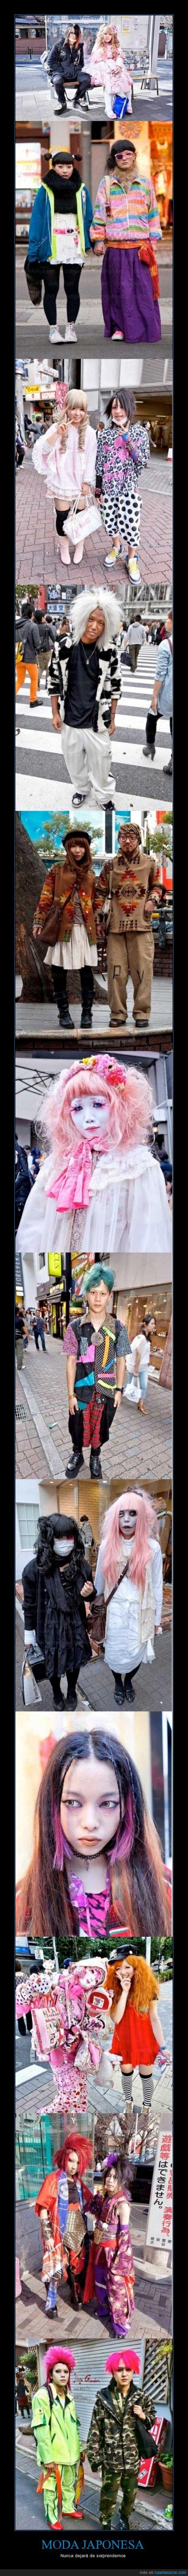 decora,estilo,ganguro,gothic,hide,japon,lolita,moda,punk,ropa,tribu,urbana